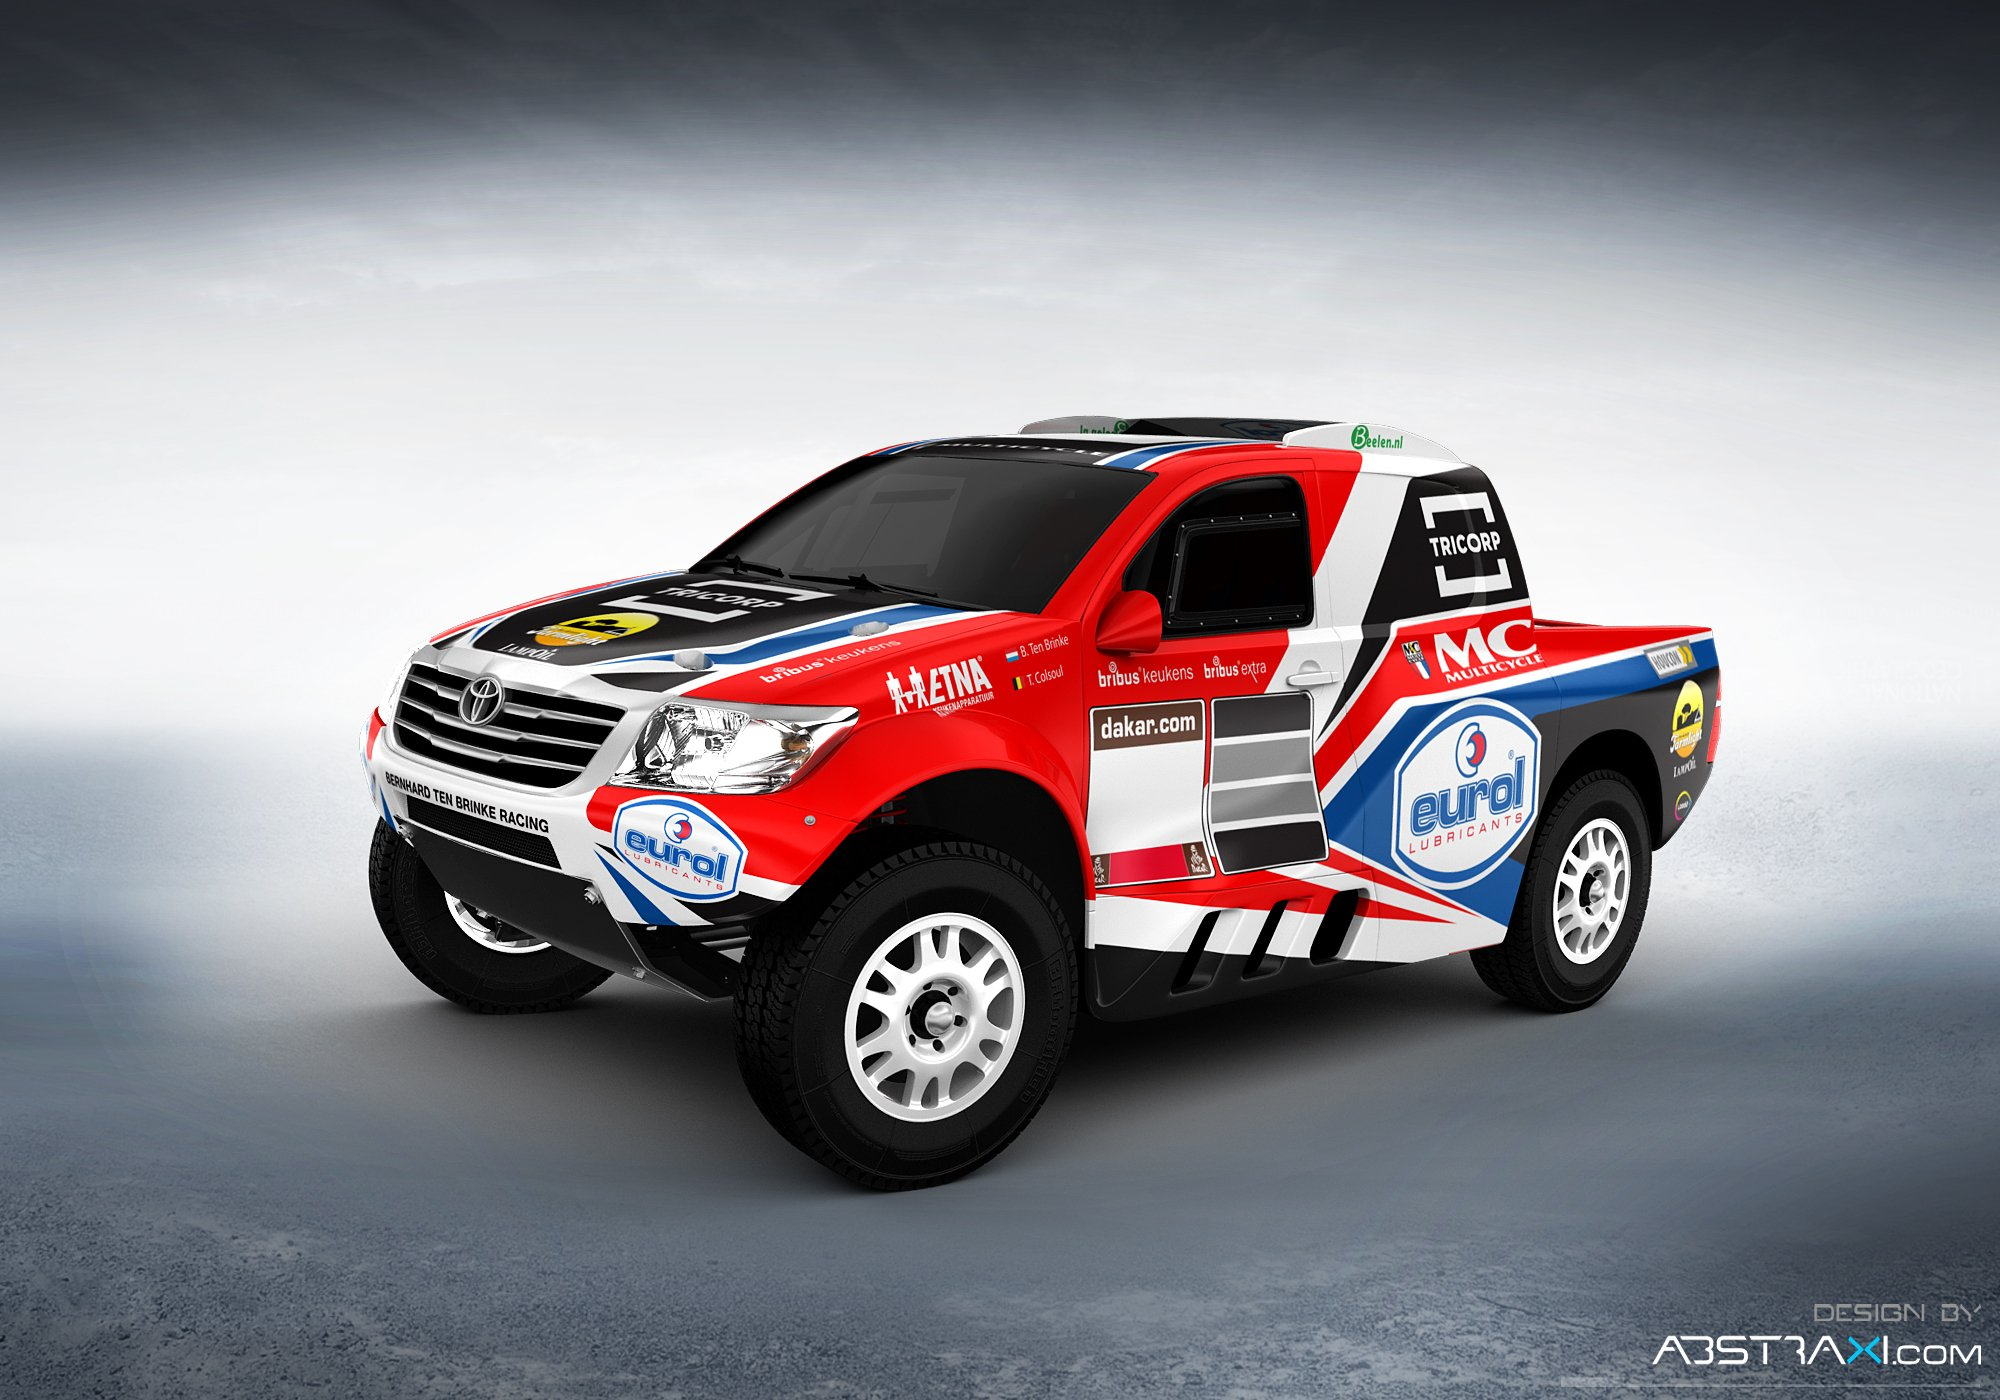 2016 Rallye Raid Dakar Argentina - Bolivia [3-16 Enero] - Página 2 CTIqc5rWoAQljIj